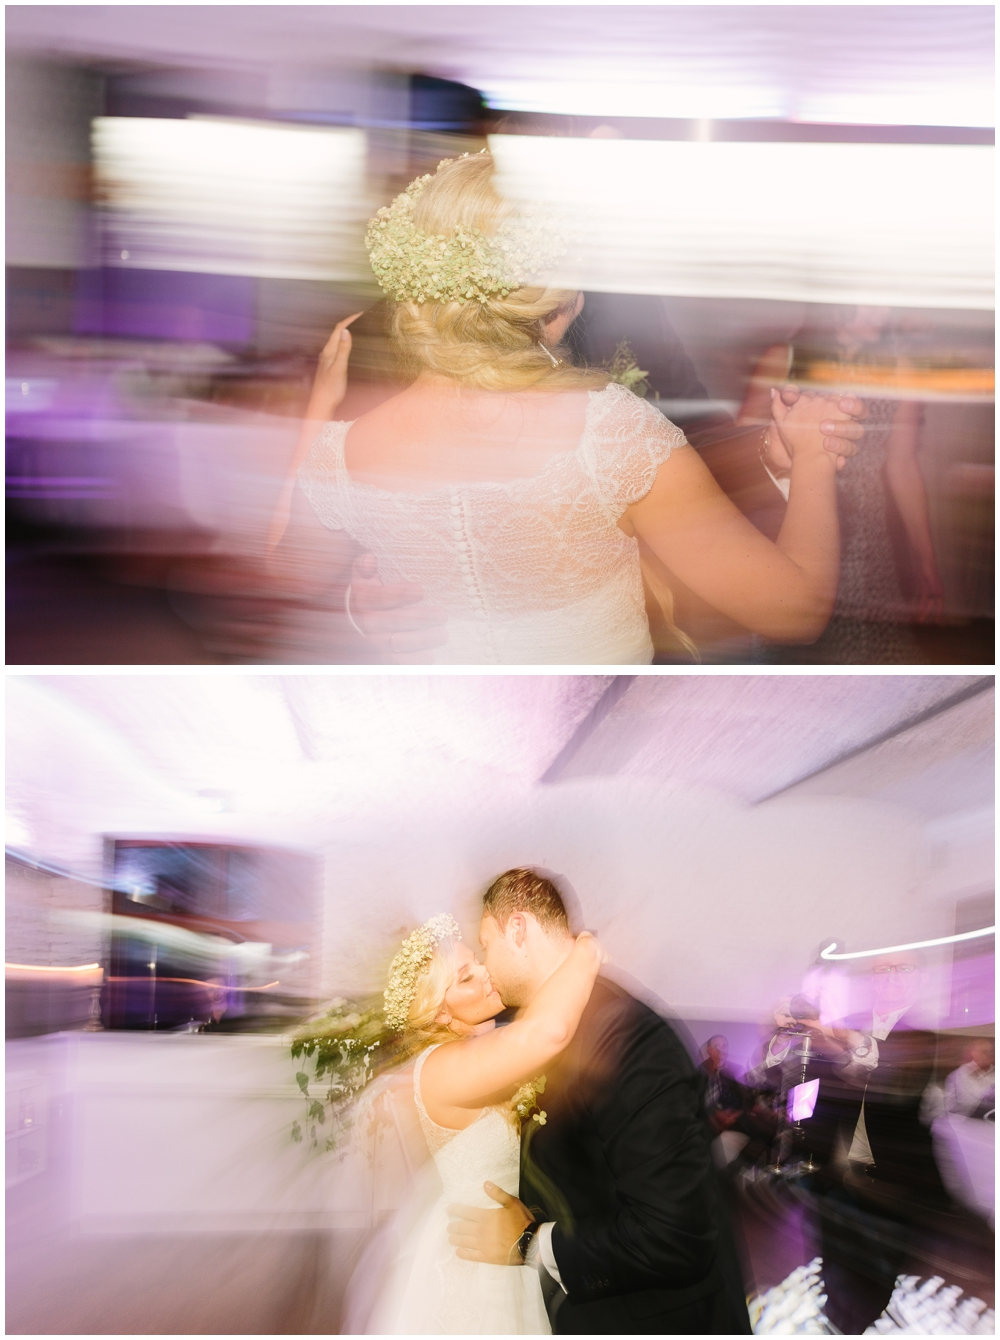 LE HAI LINH Photography-Hochzeitsfotograf-Hochzeitsreportage in Gut Hohenholz_0134.jpg